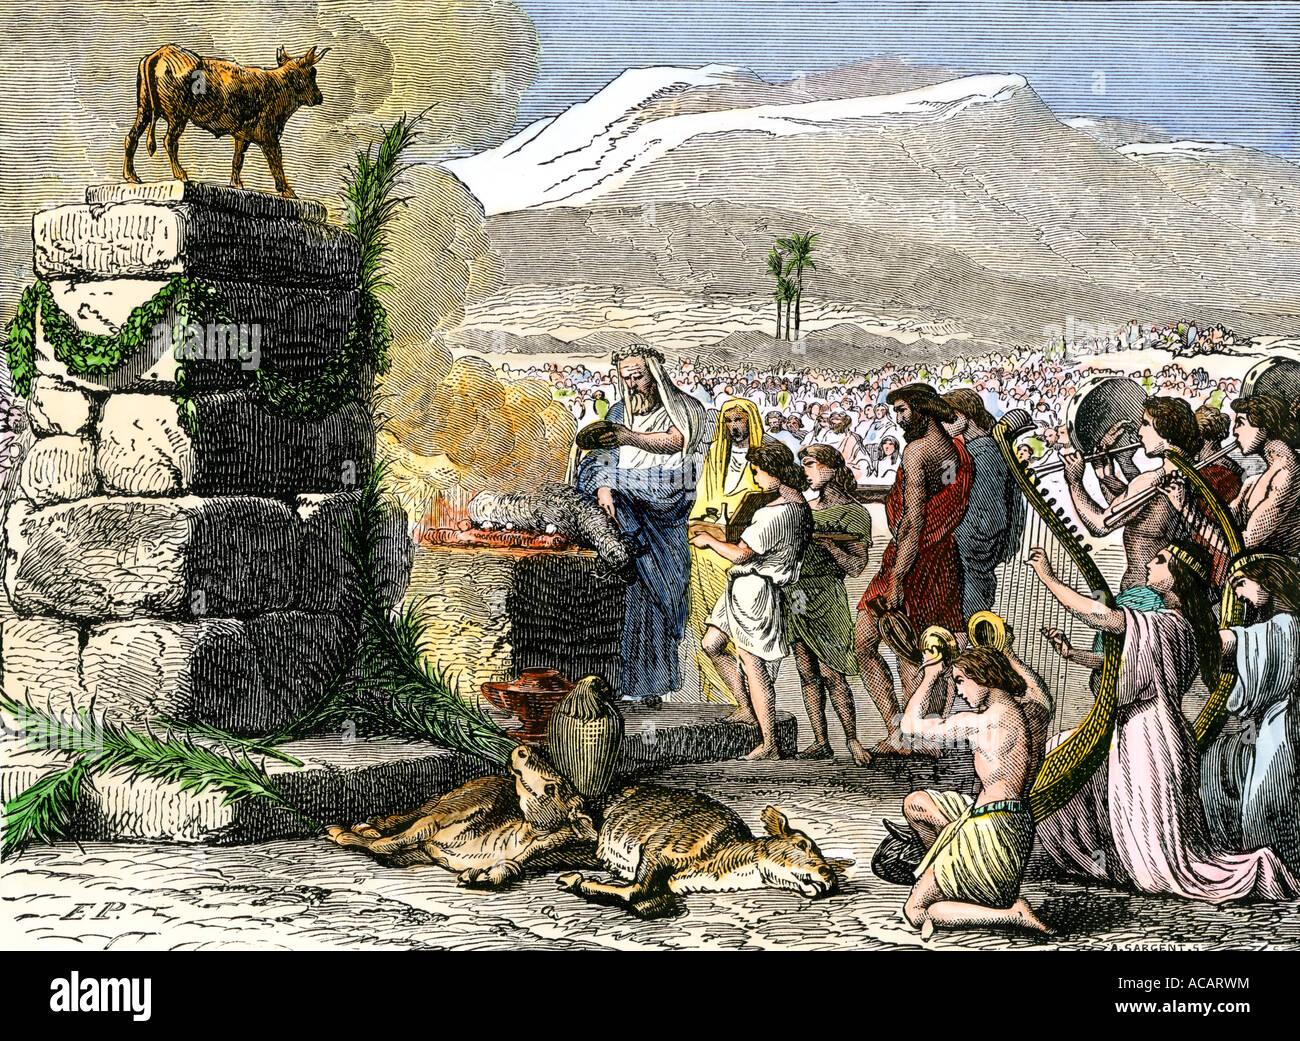 Free coloring page golden calf - Animal Sacrifice To Worship A Golden Calf In Biblical Times Stock Image